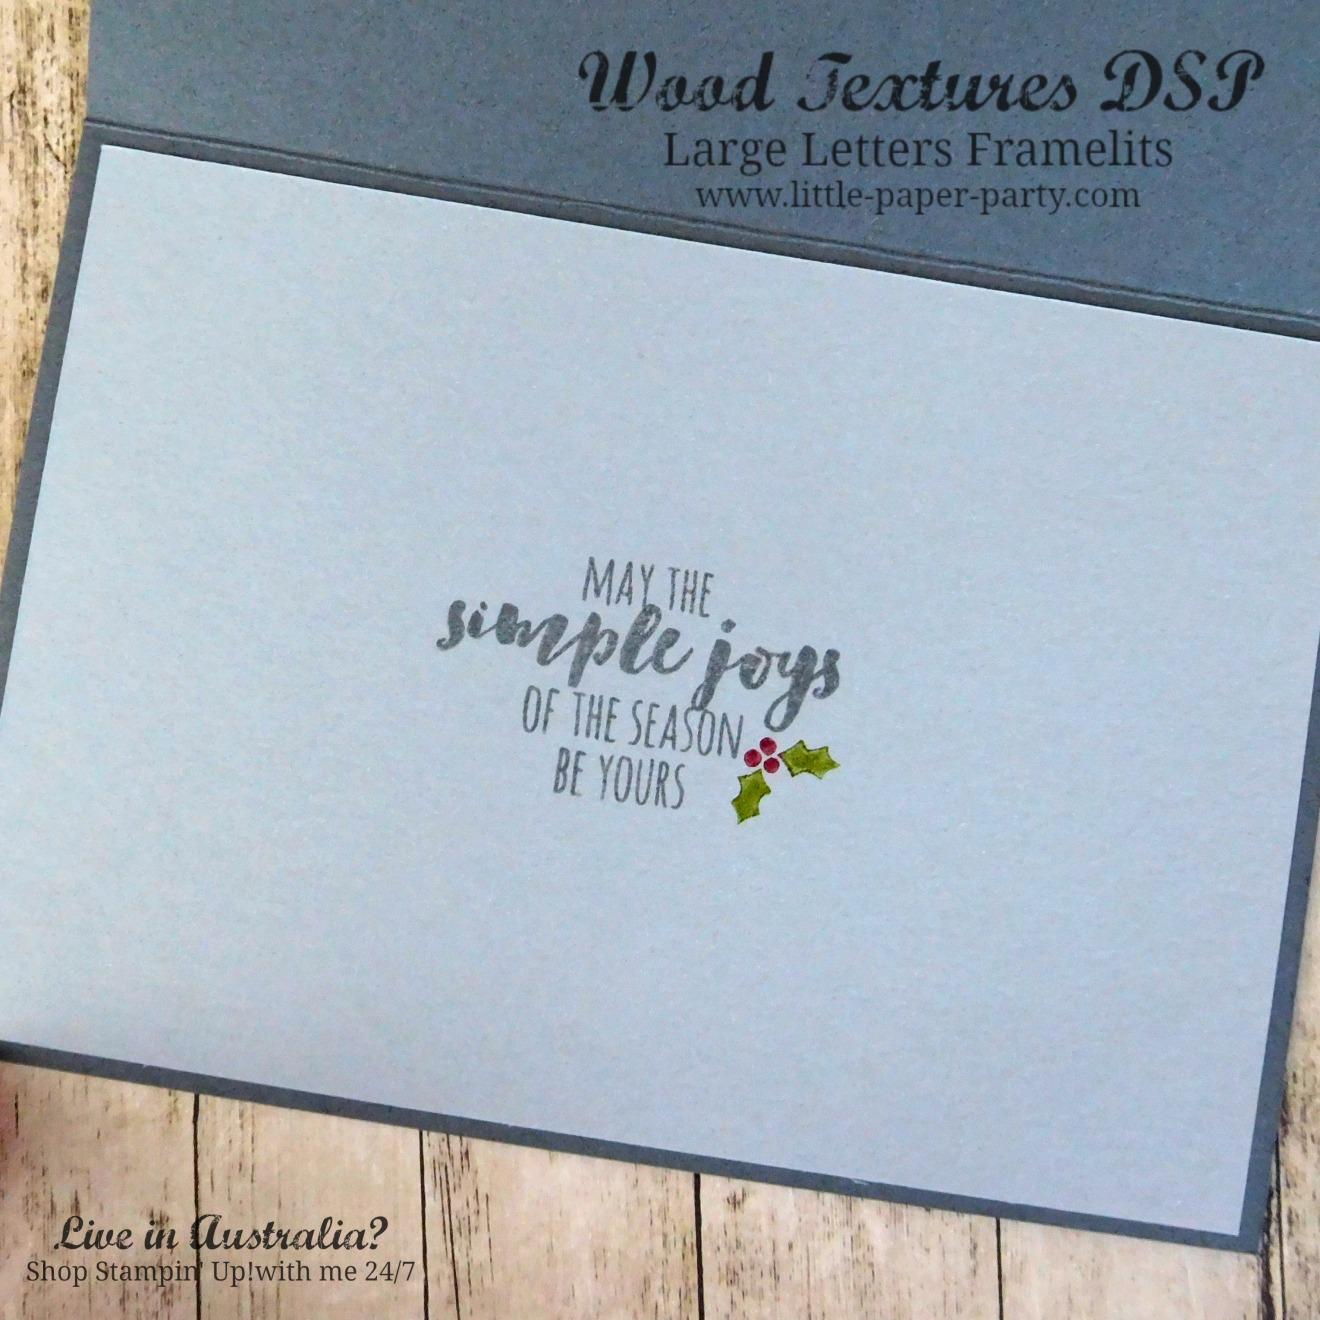 Little Paper Party, Large Letter Framelits, Wood Textures DSP, #3.jpg